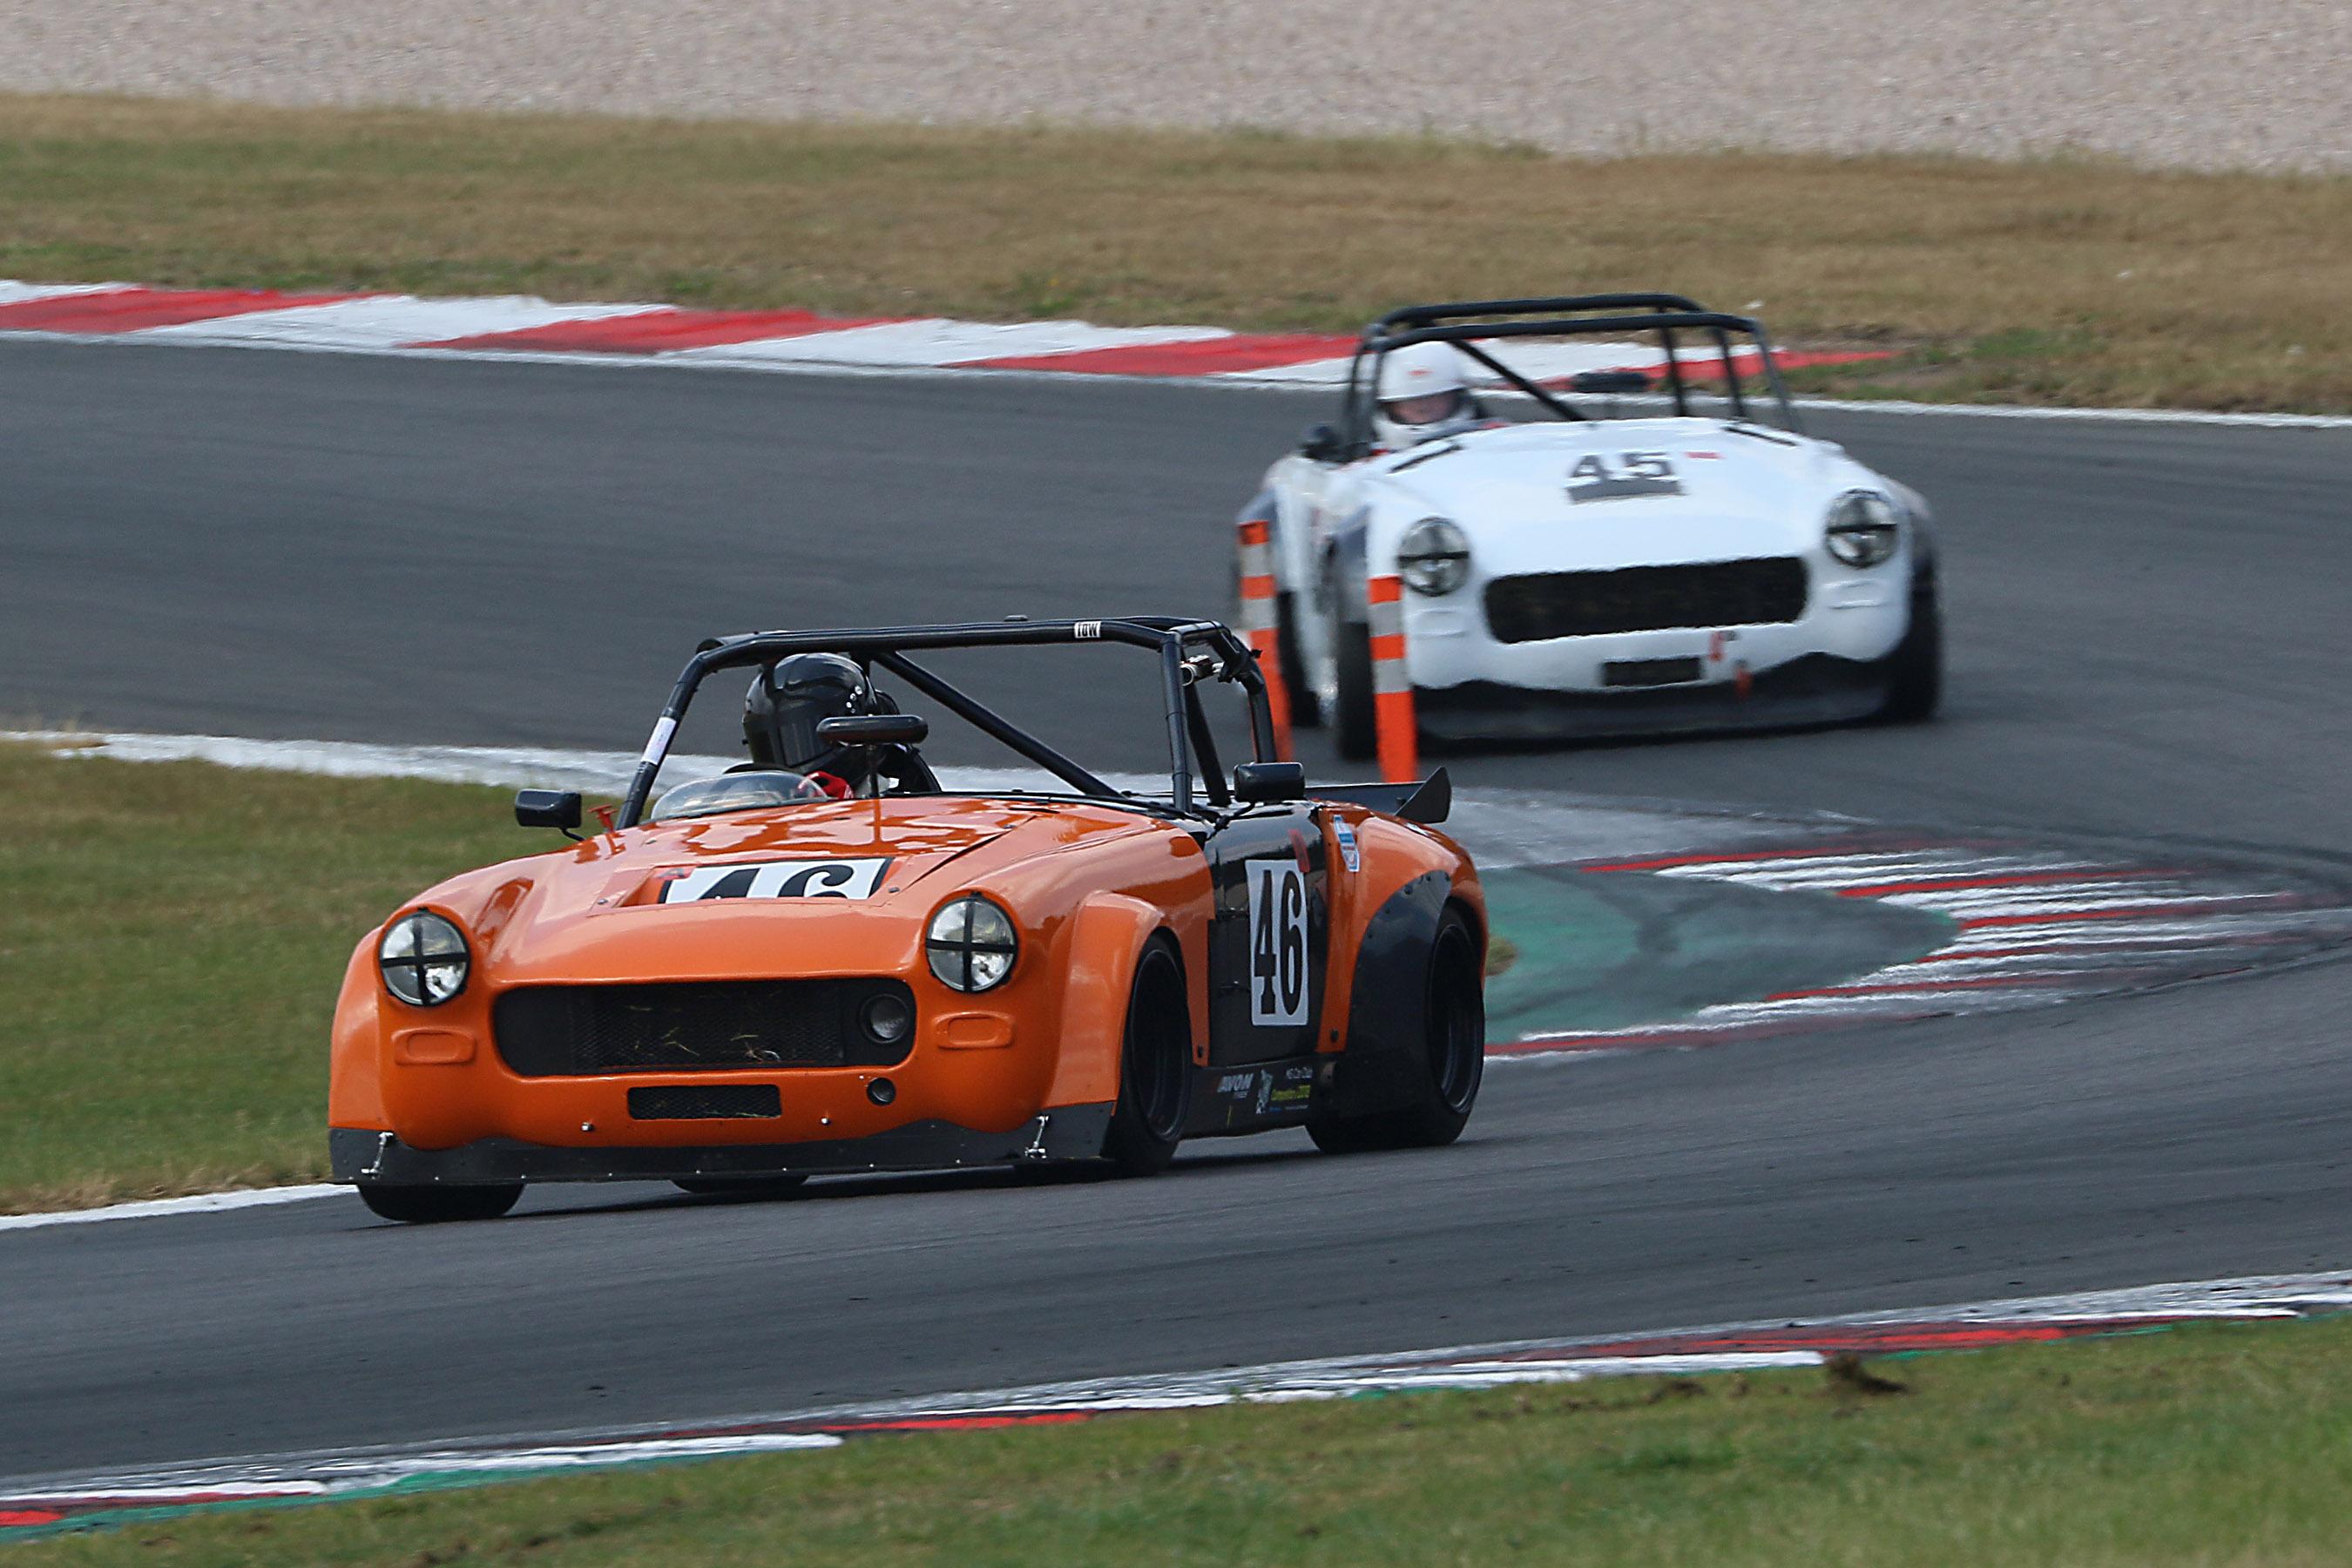 British Sportscar Weekend - Donington Park Race Report